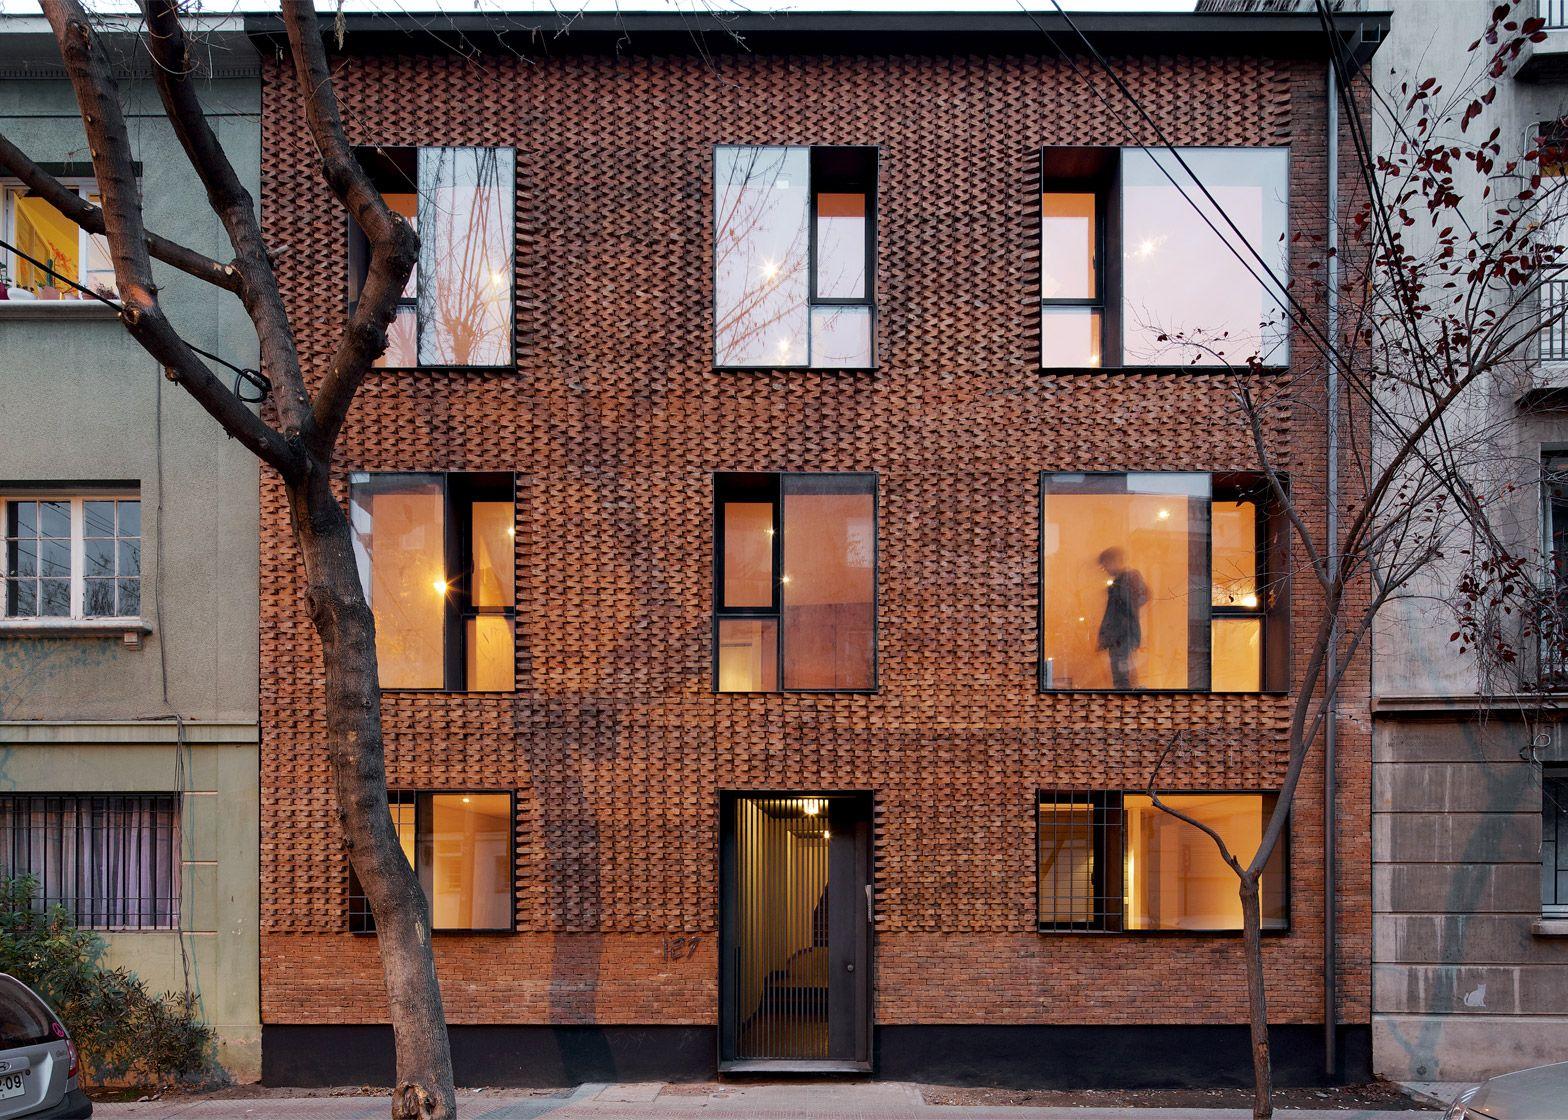 MAPA updates Chilean housing block with textured brick